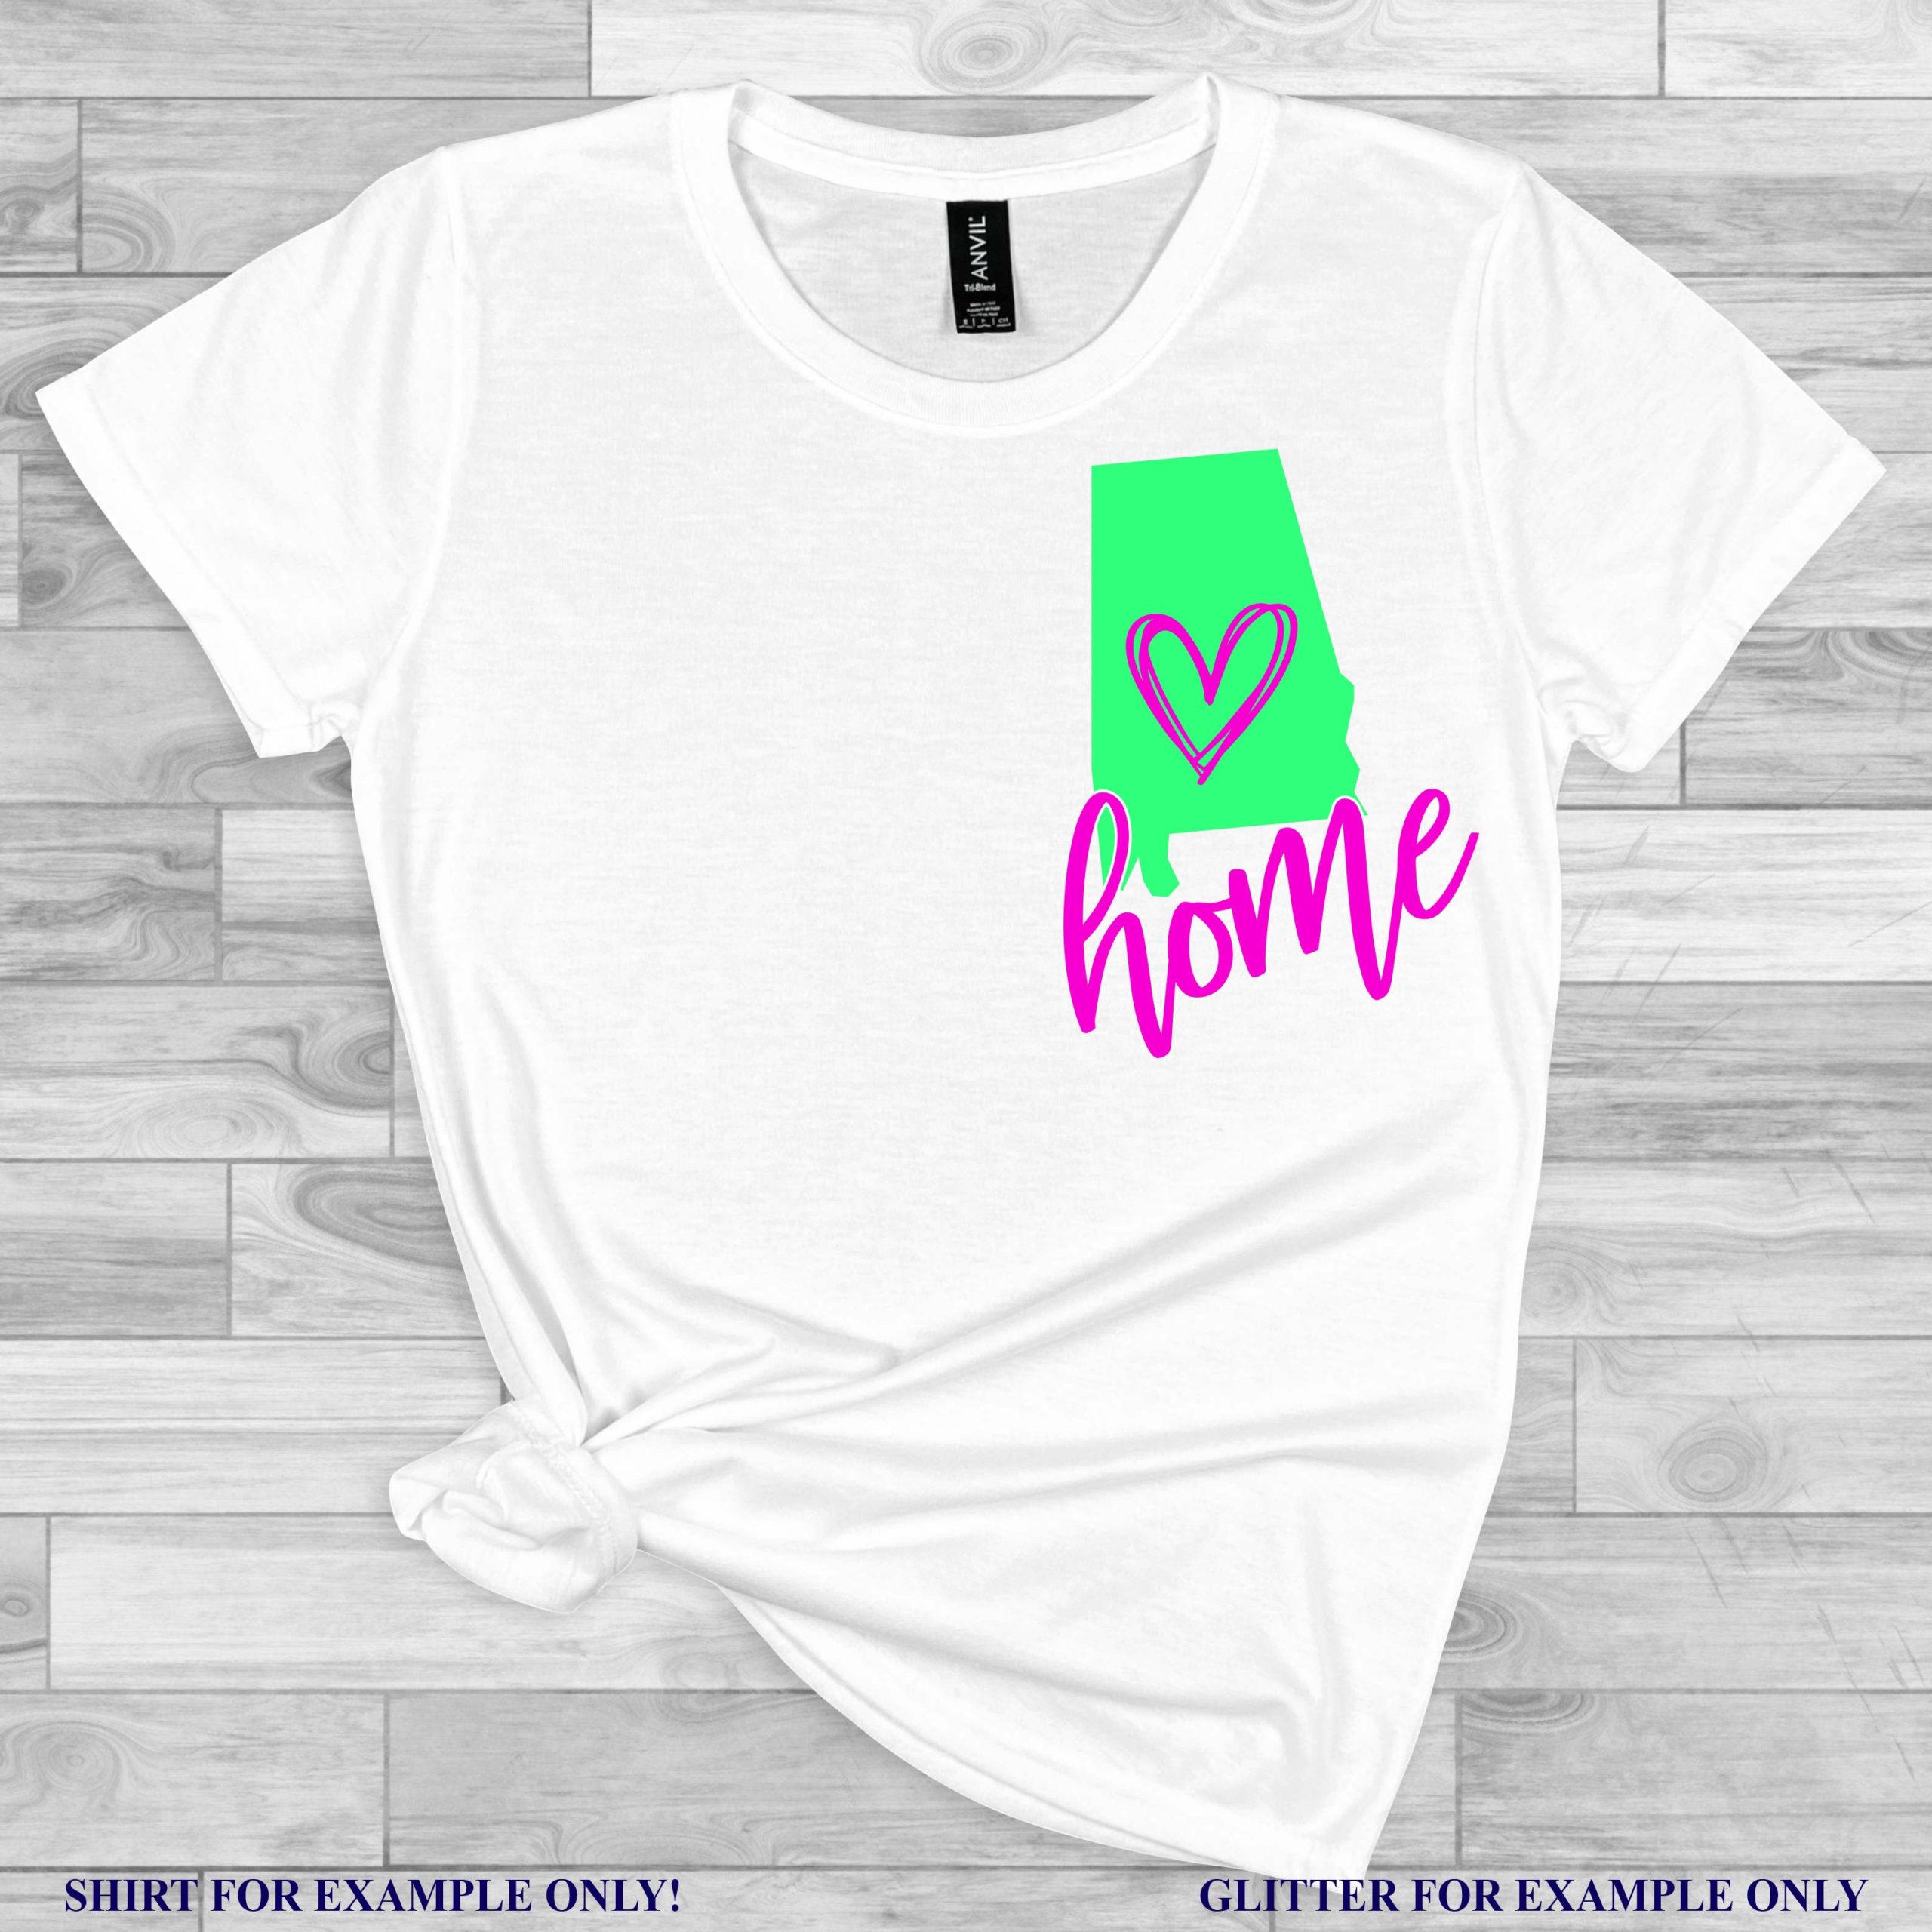 Alabama-svg-state-svg-home-state-svg-home-svg-state-home-svgalabama-state-cuttable-svg-designs-cuttable-cut-file-cricut-svg-60513133